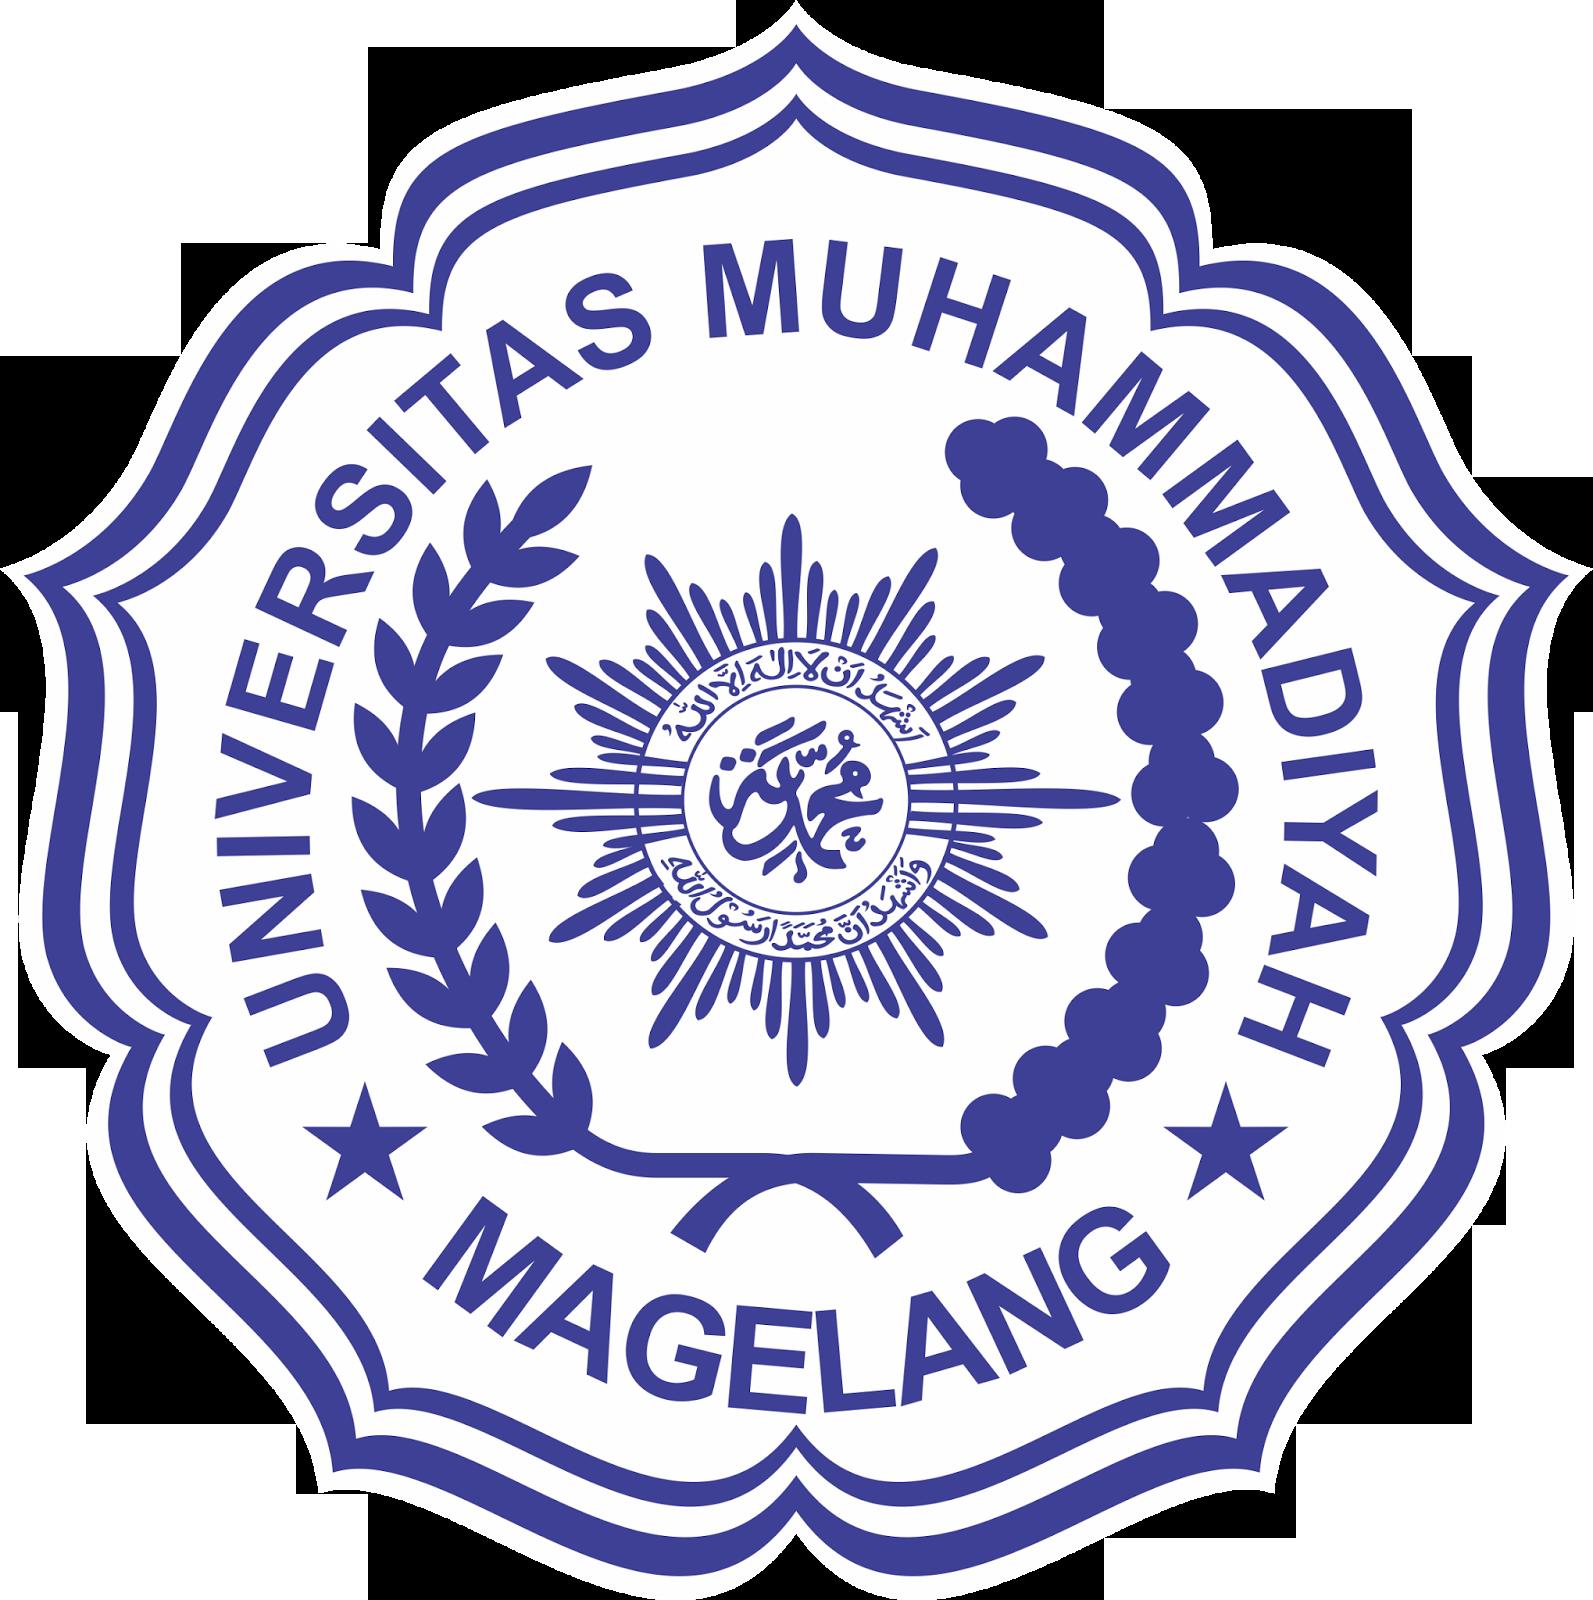 Logo UMMGL (Universitas Muhammadiyah Magelang) Biru